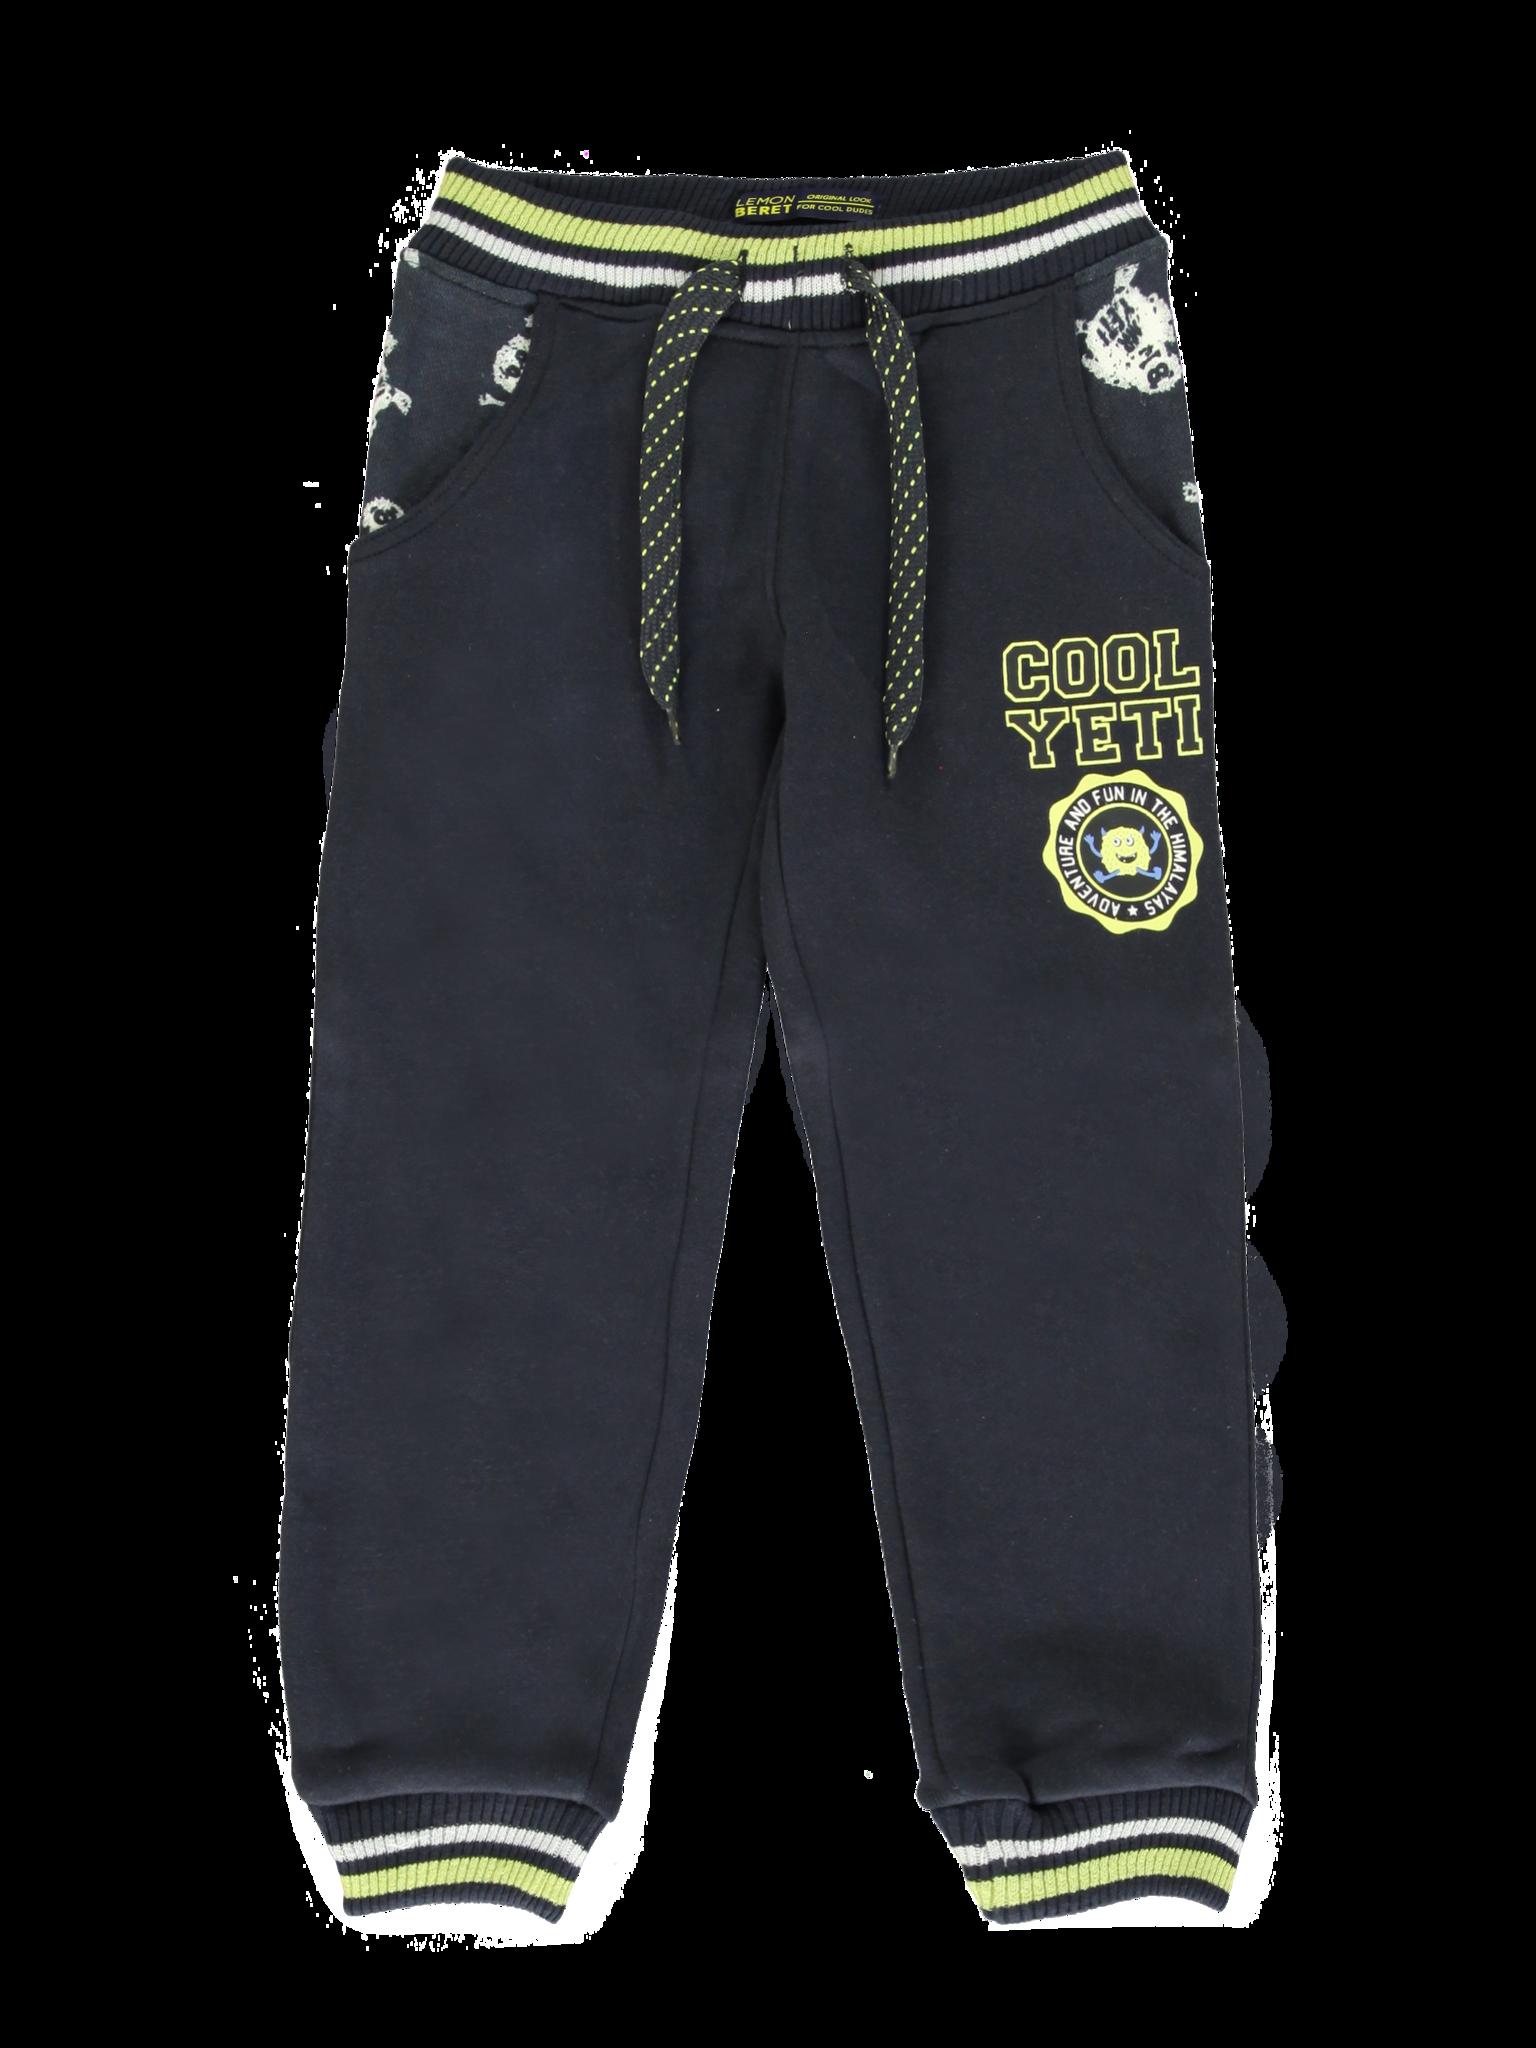 All Brands | Winterproducts Small Boys | Jogging Pant | 12 pcs/box